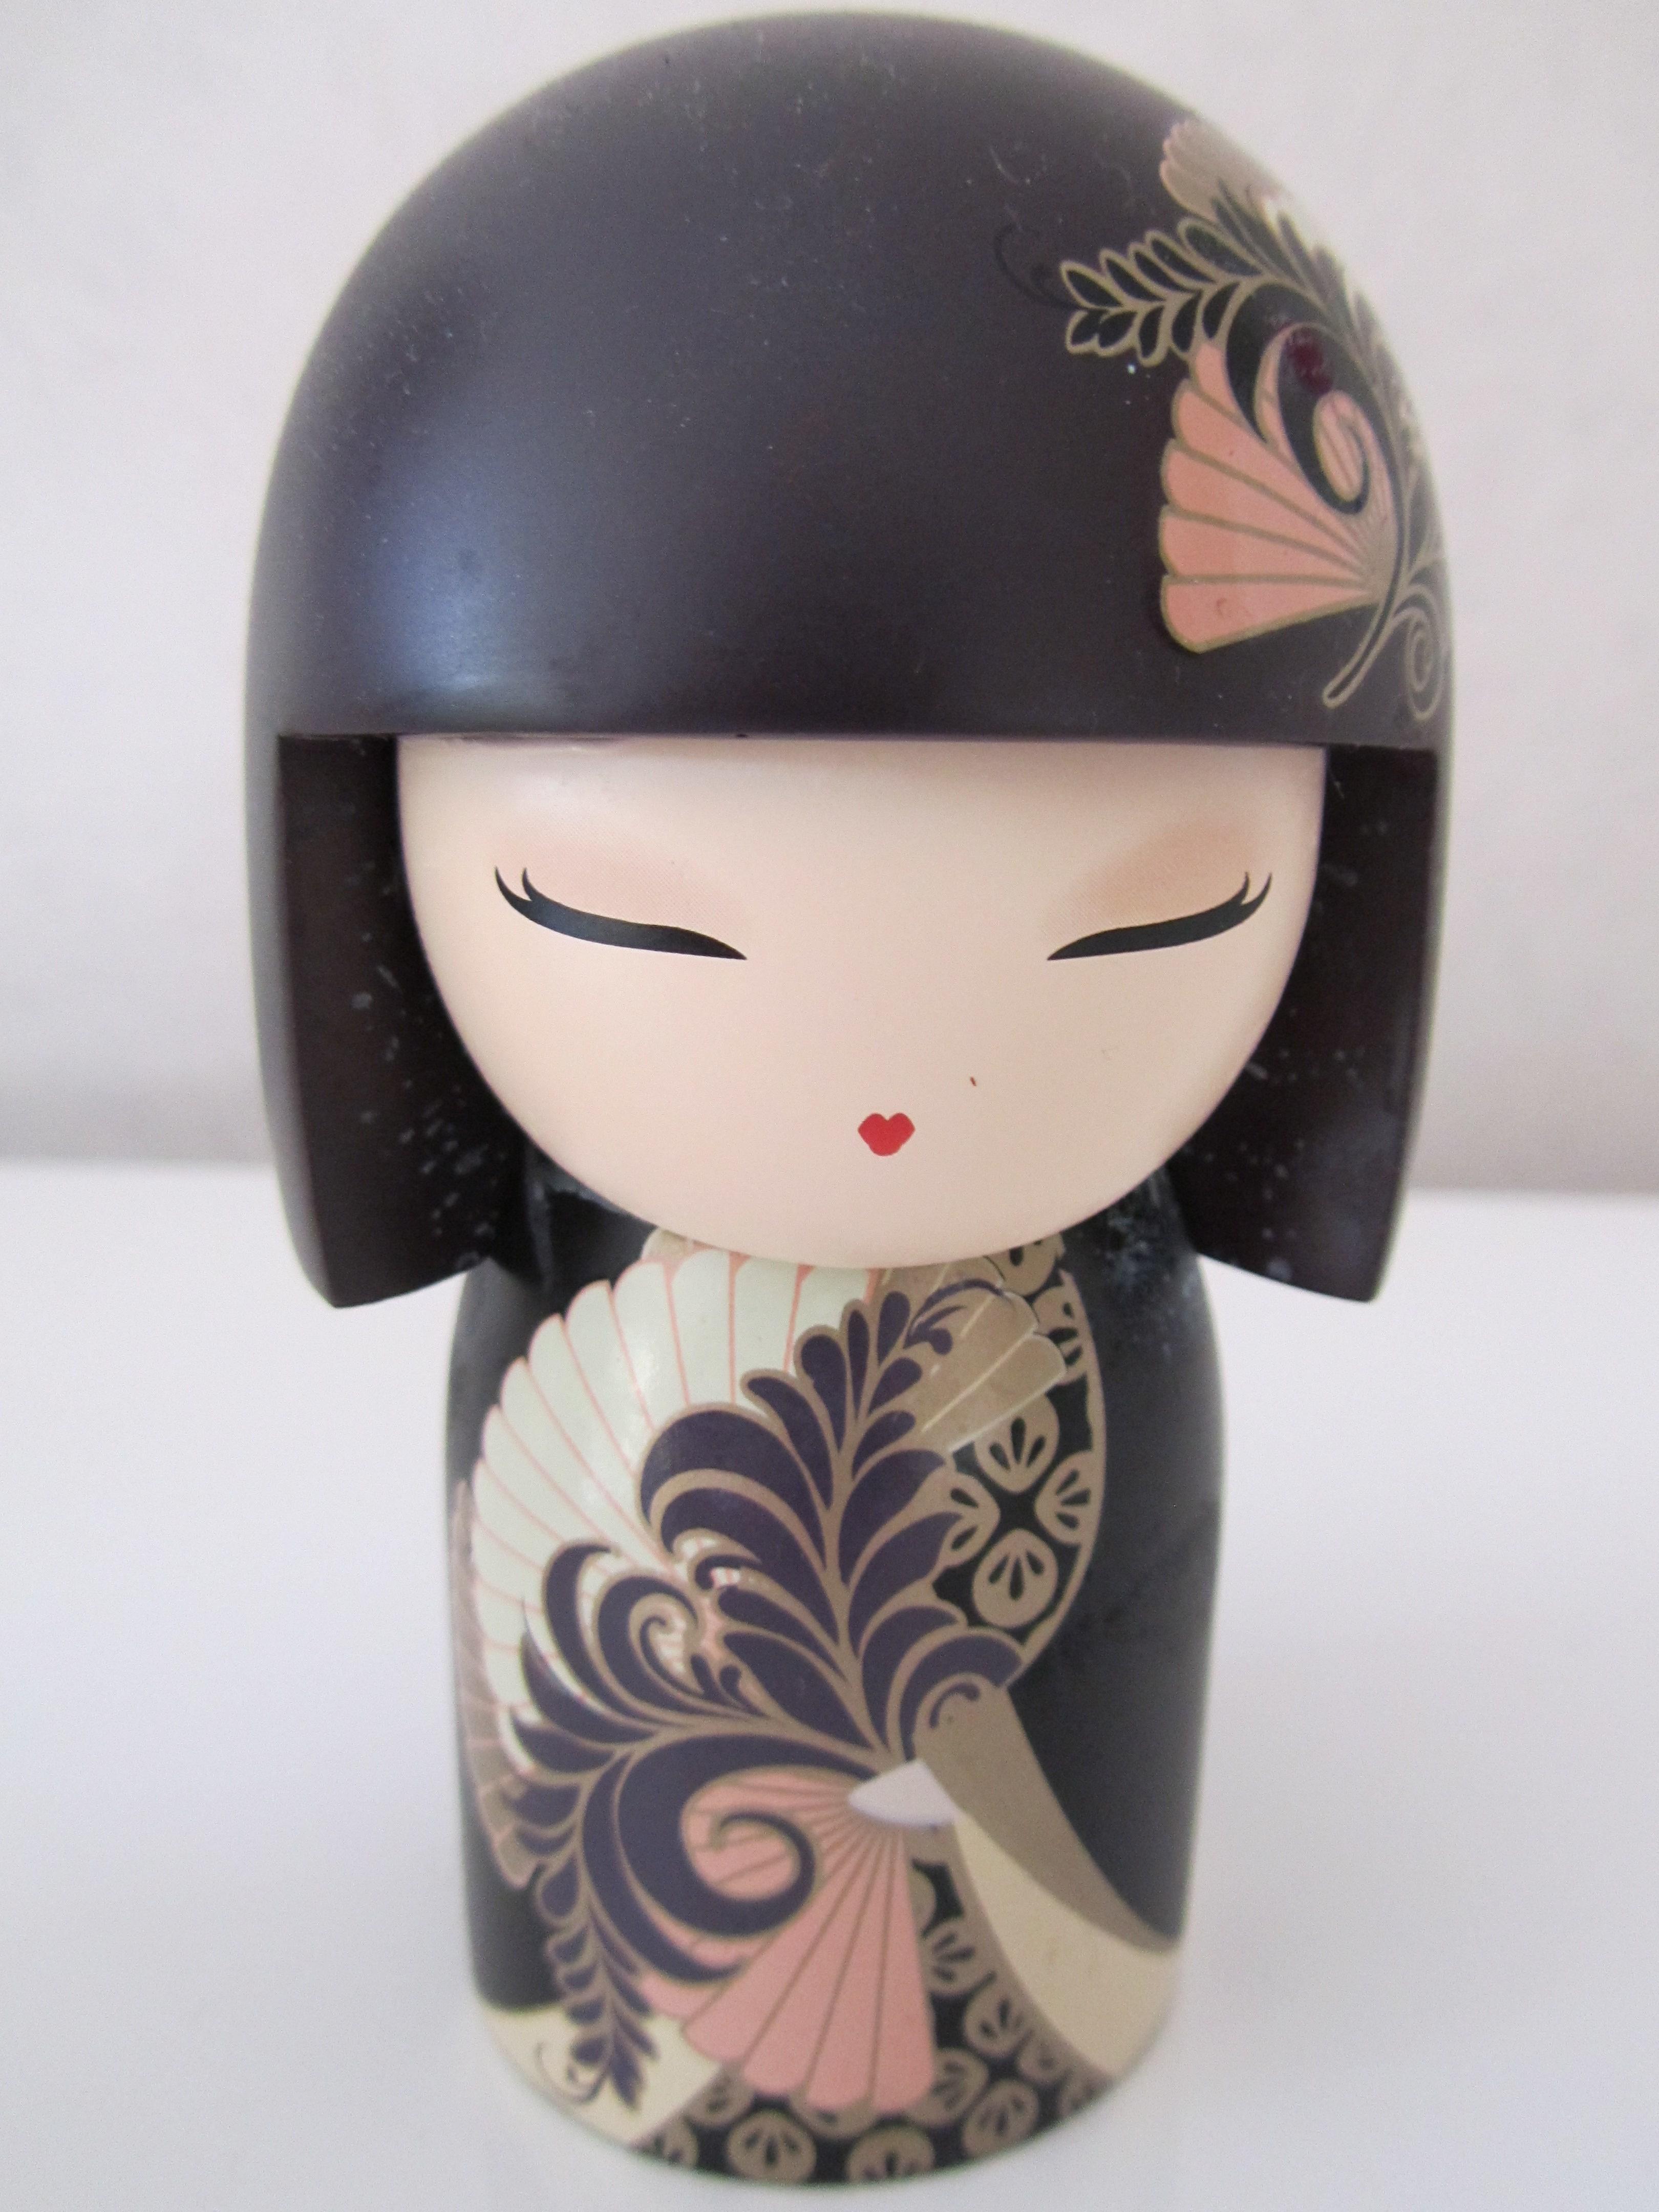 guérande la baule massage shiatsu reflexologie bien être cadeau zen 10